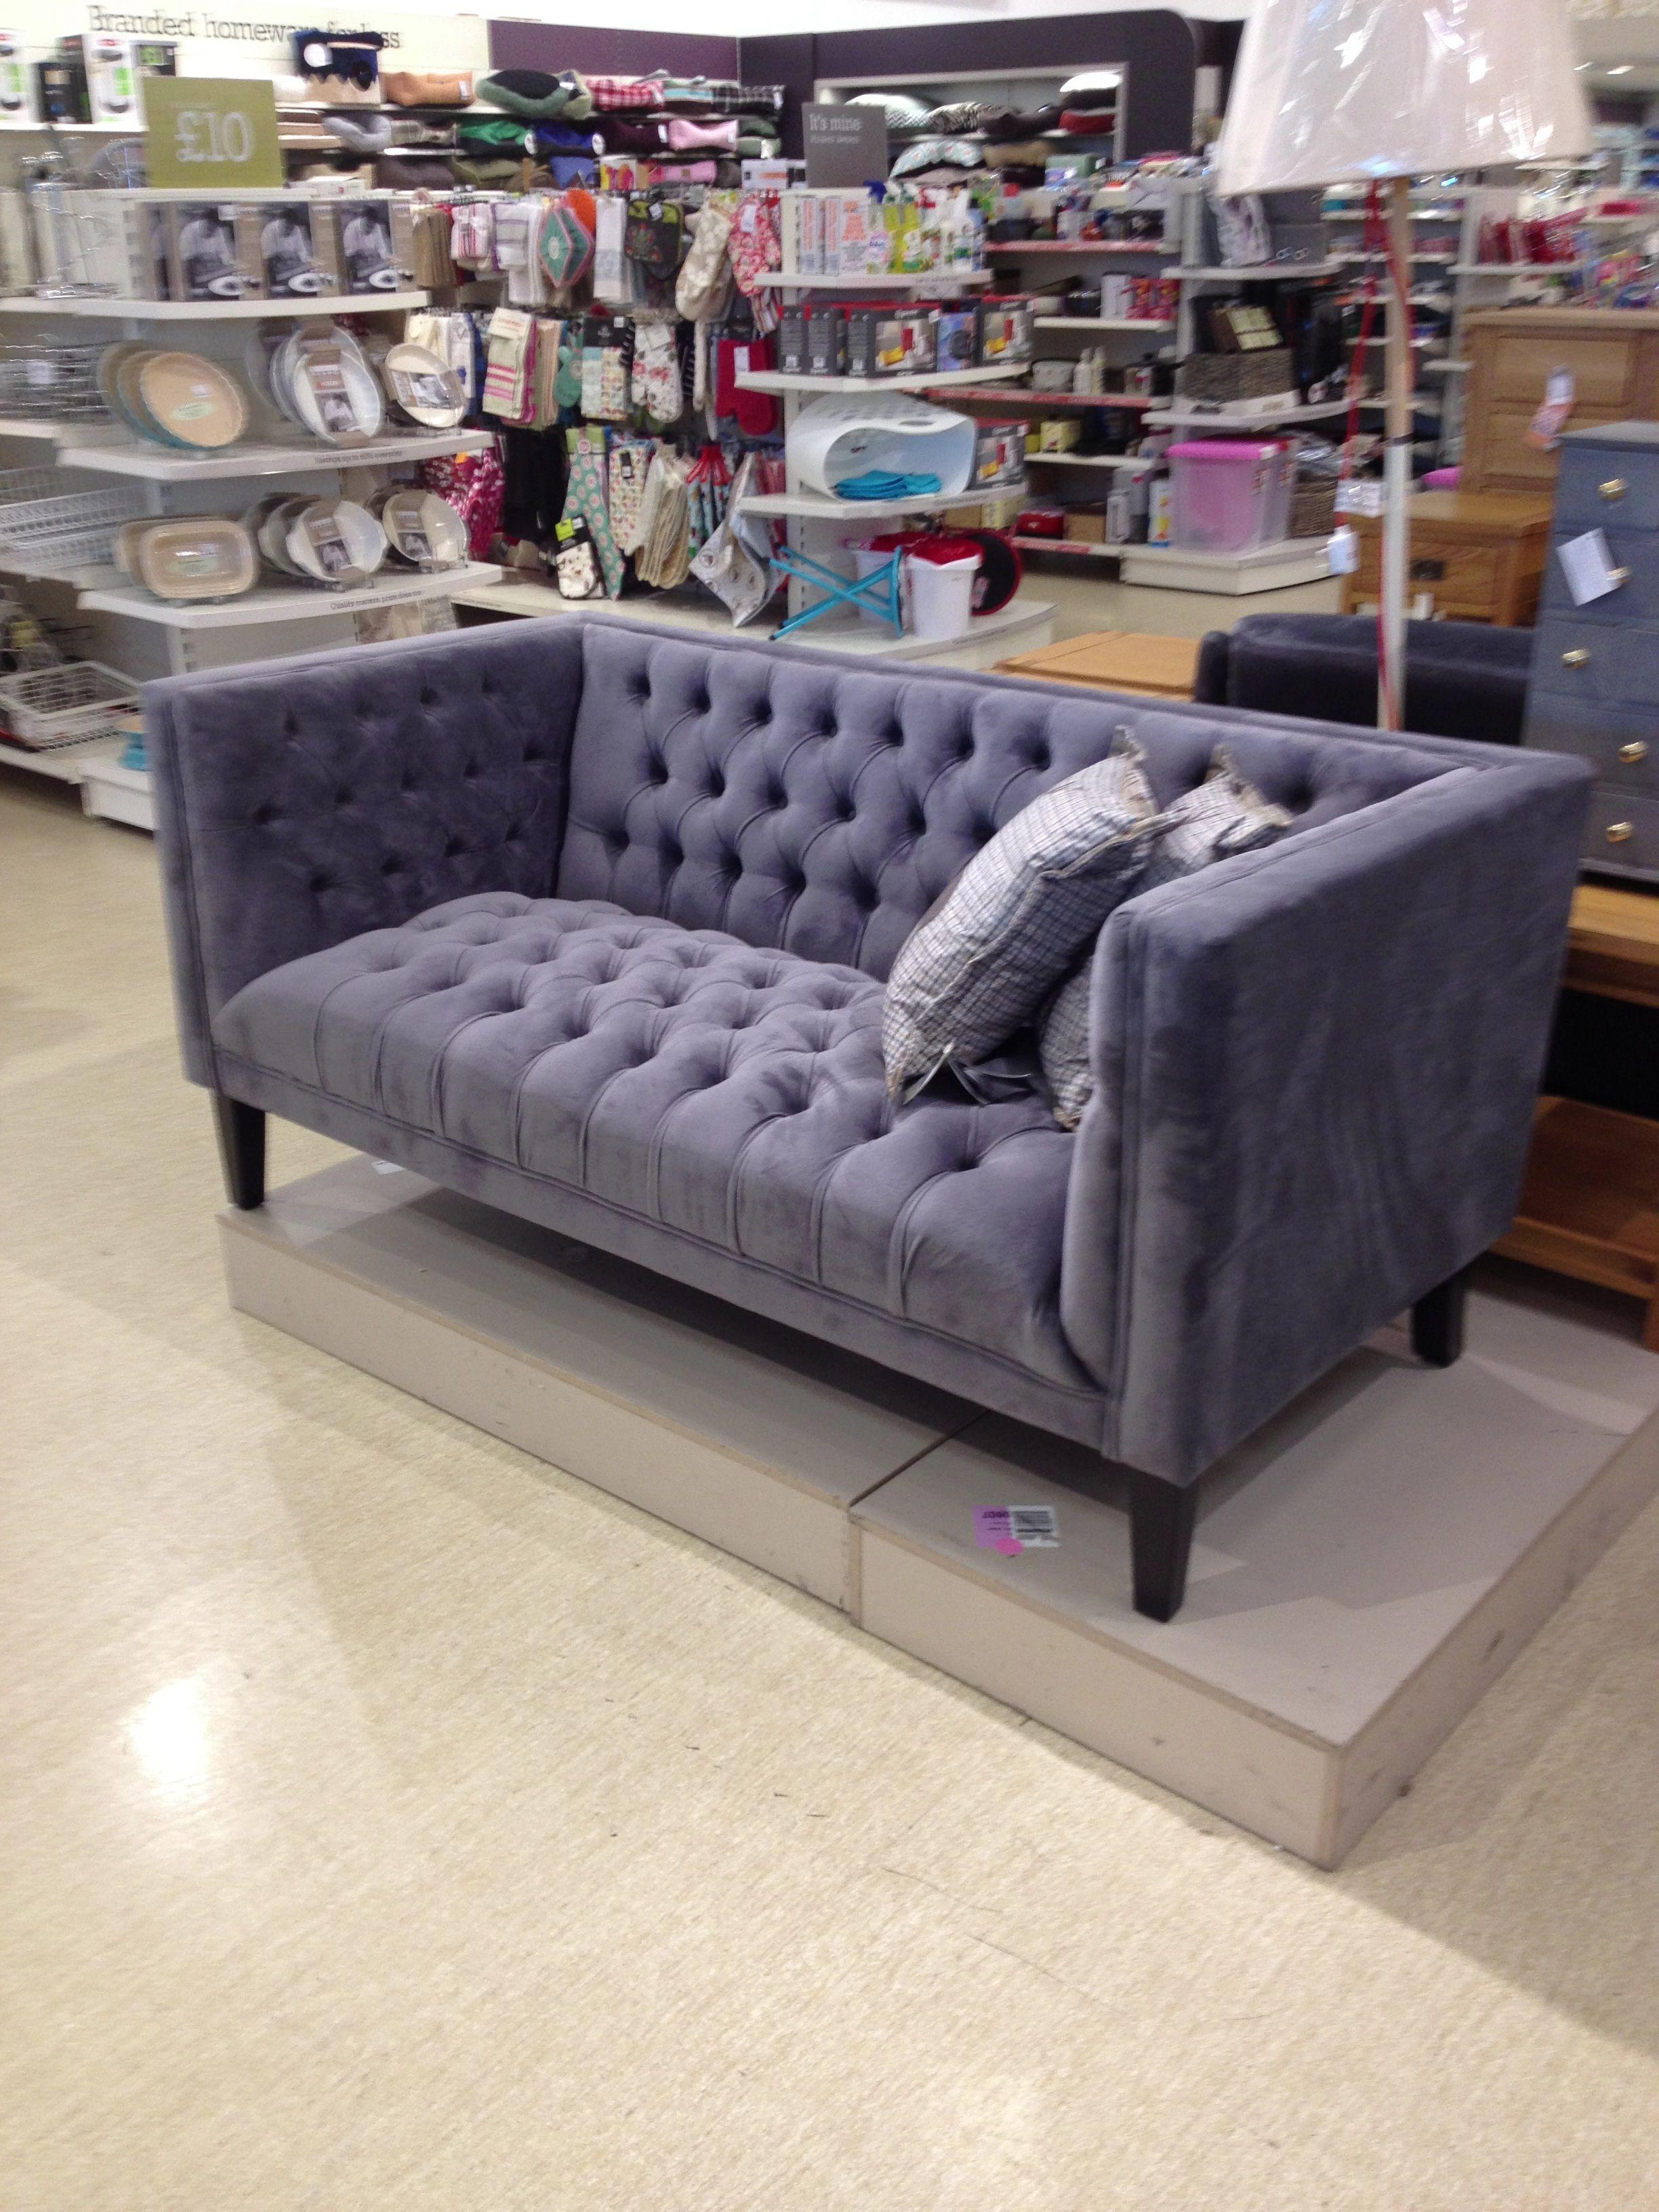 Retro Sofa At Home Sense Homesensestyle Homesense Canada Retro Sofa Sofa Flat Decor Homesense living room decor